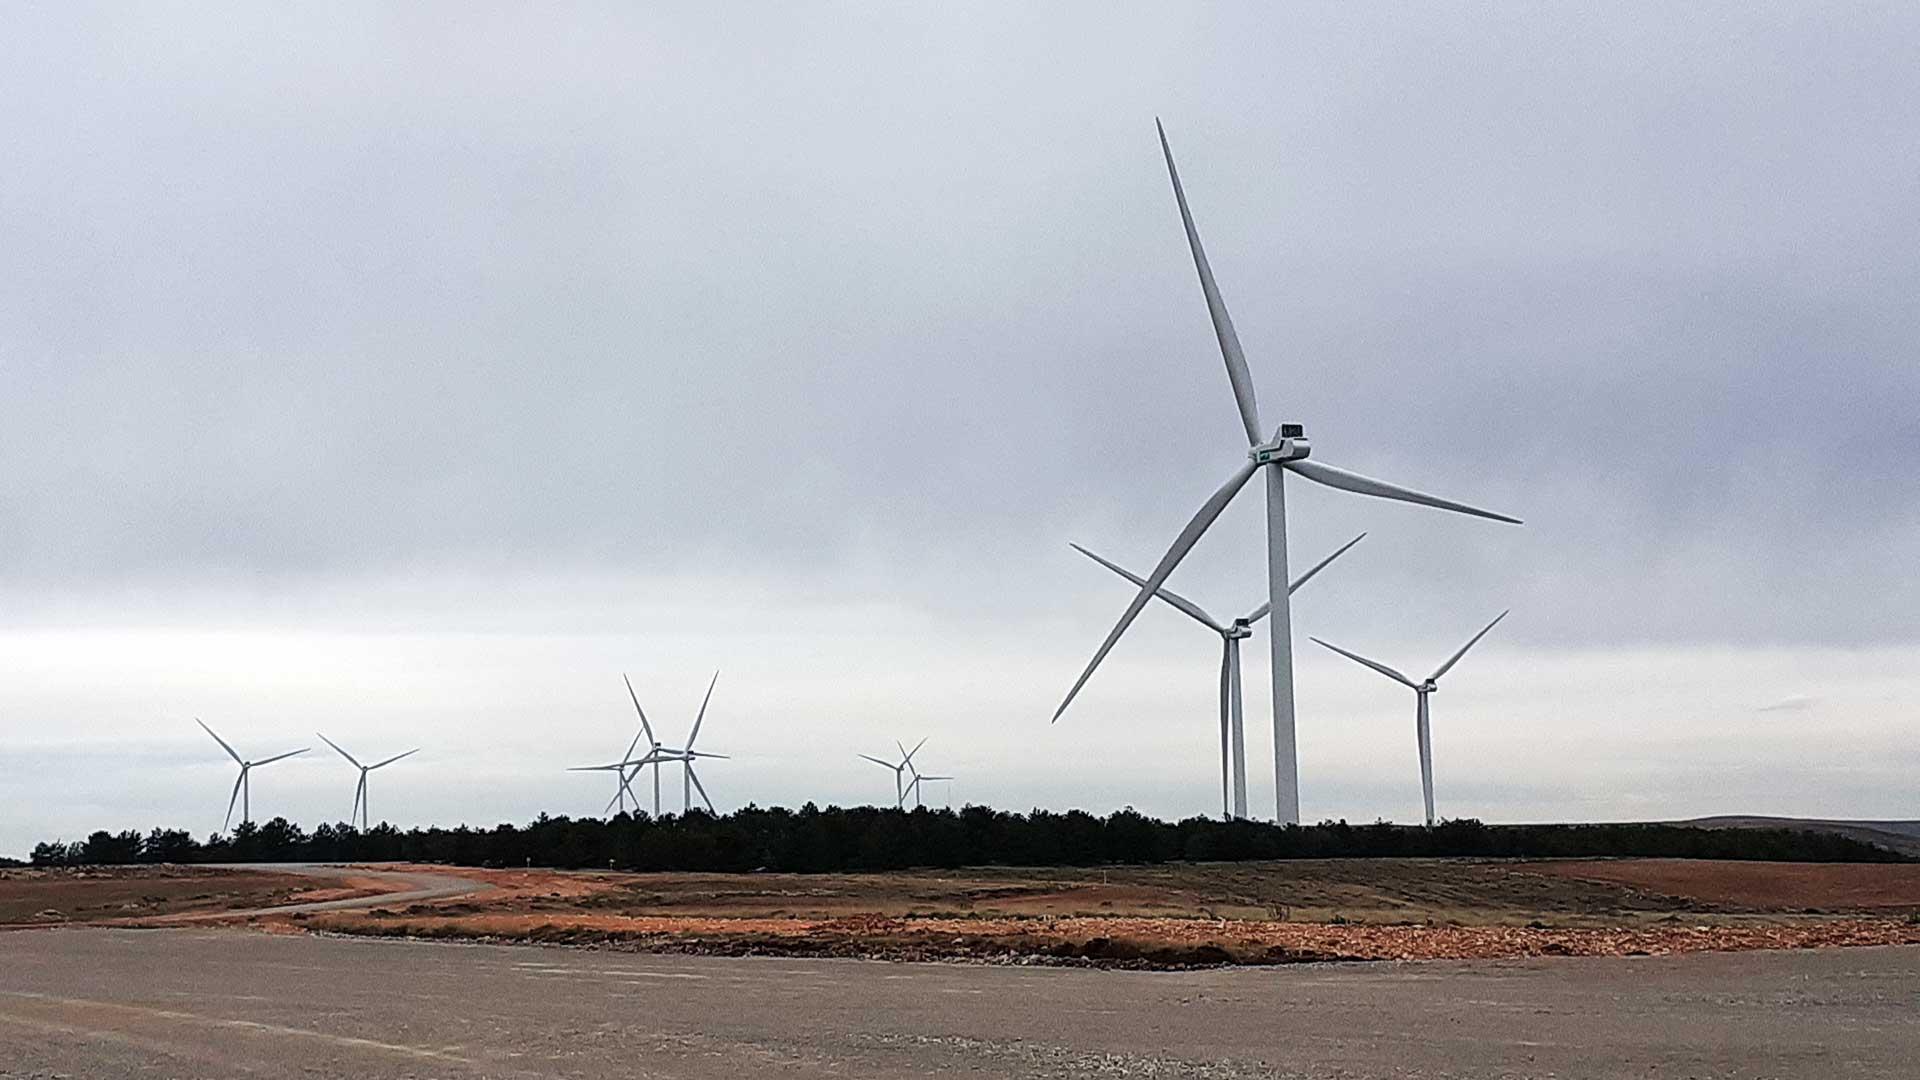 El futuro de las renovables se fragua en Teruel